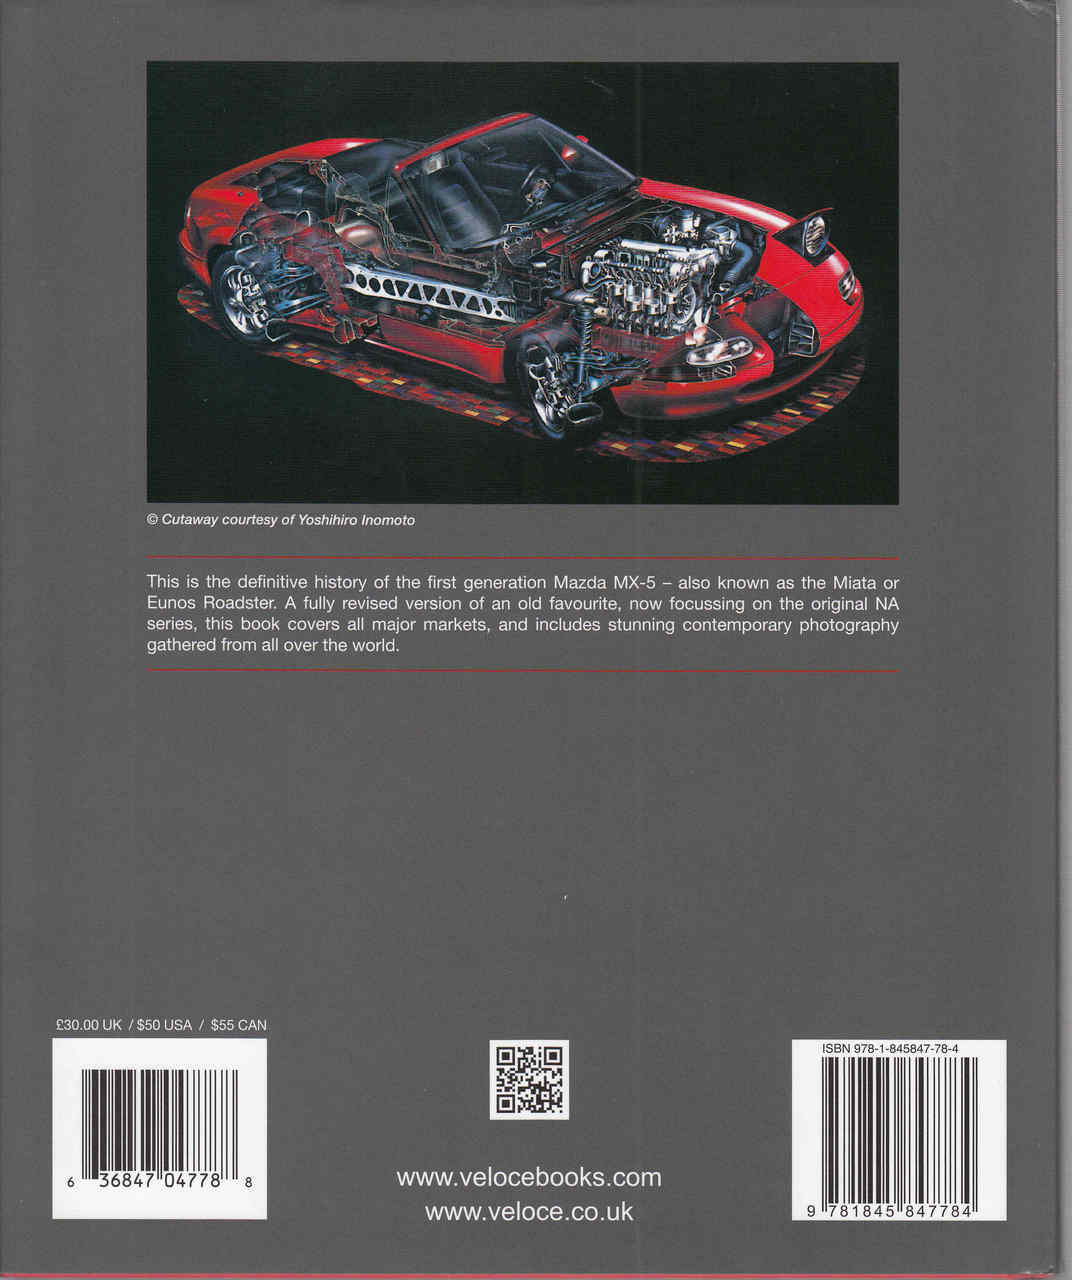 TPMS Hlyjoon 15114379 Car Vehicle Tire Pressure Monitoring Sensor System for Escalade Avalanche Silverado Suburban Tahoe Sierra Yukon 2005-2006